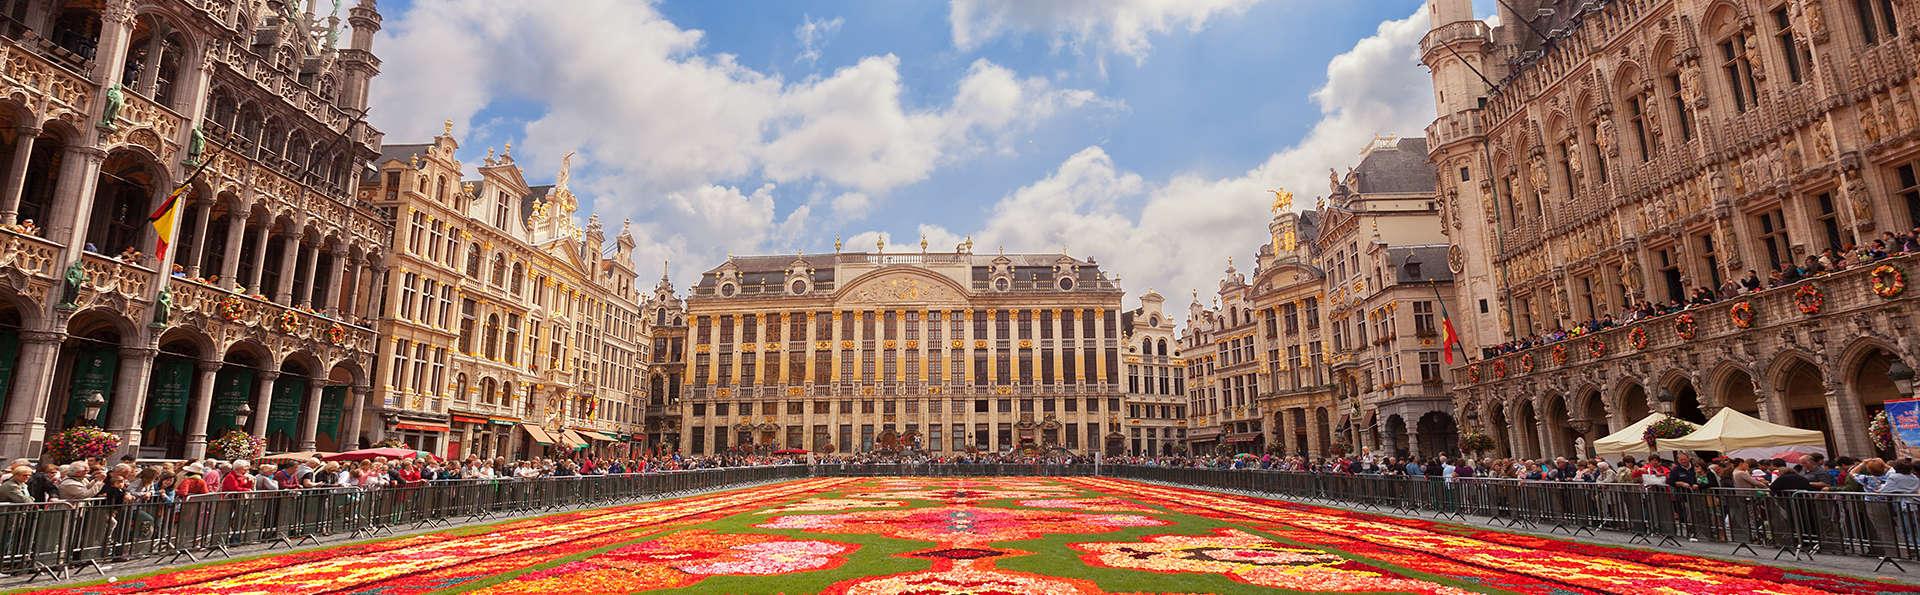 Smartflats Grand Place - EDIT_BRUSSELS.jpg